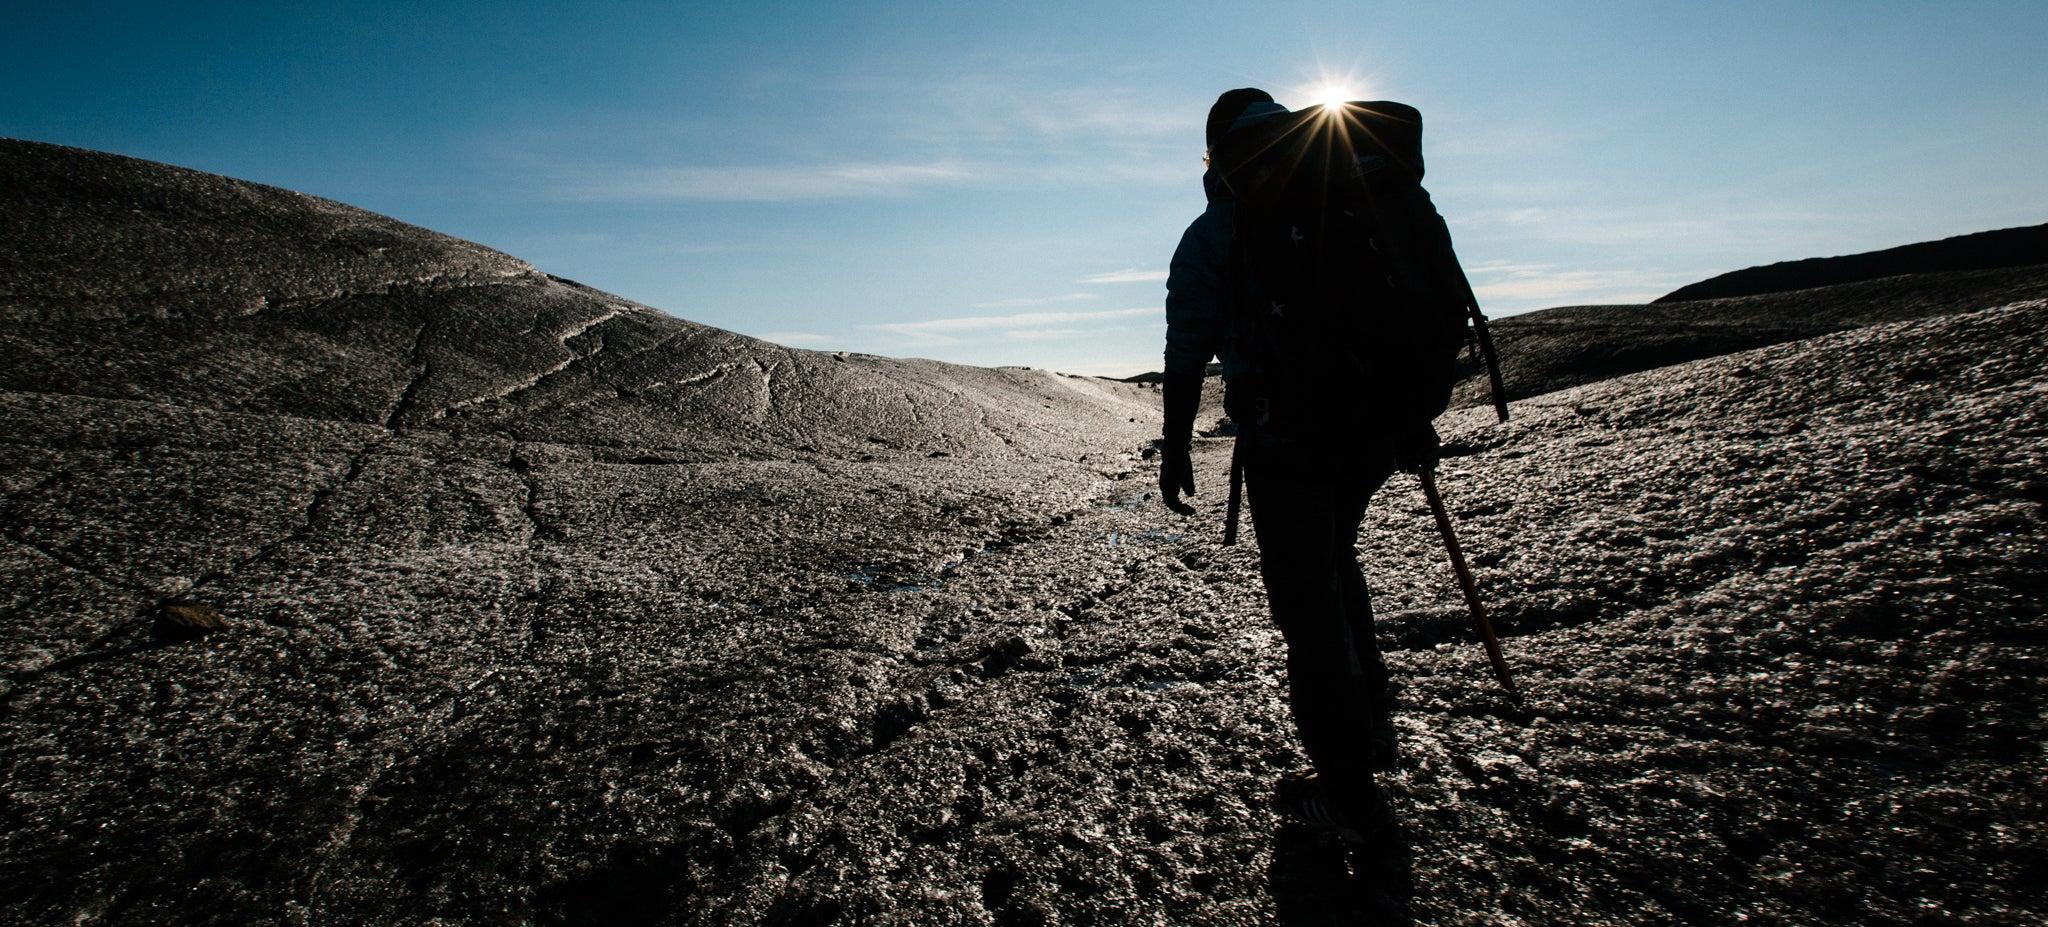 Walking On The Alien World From Interstellar